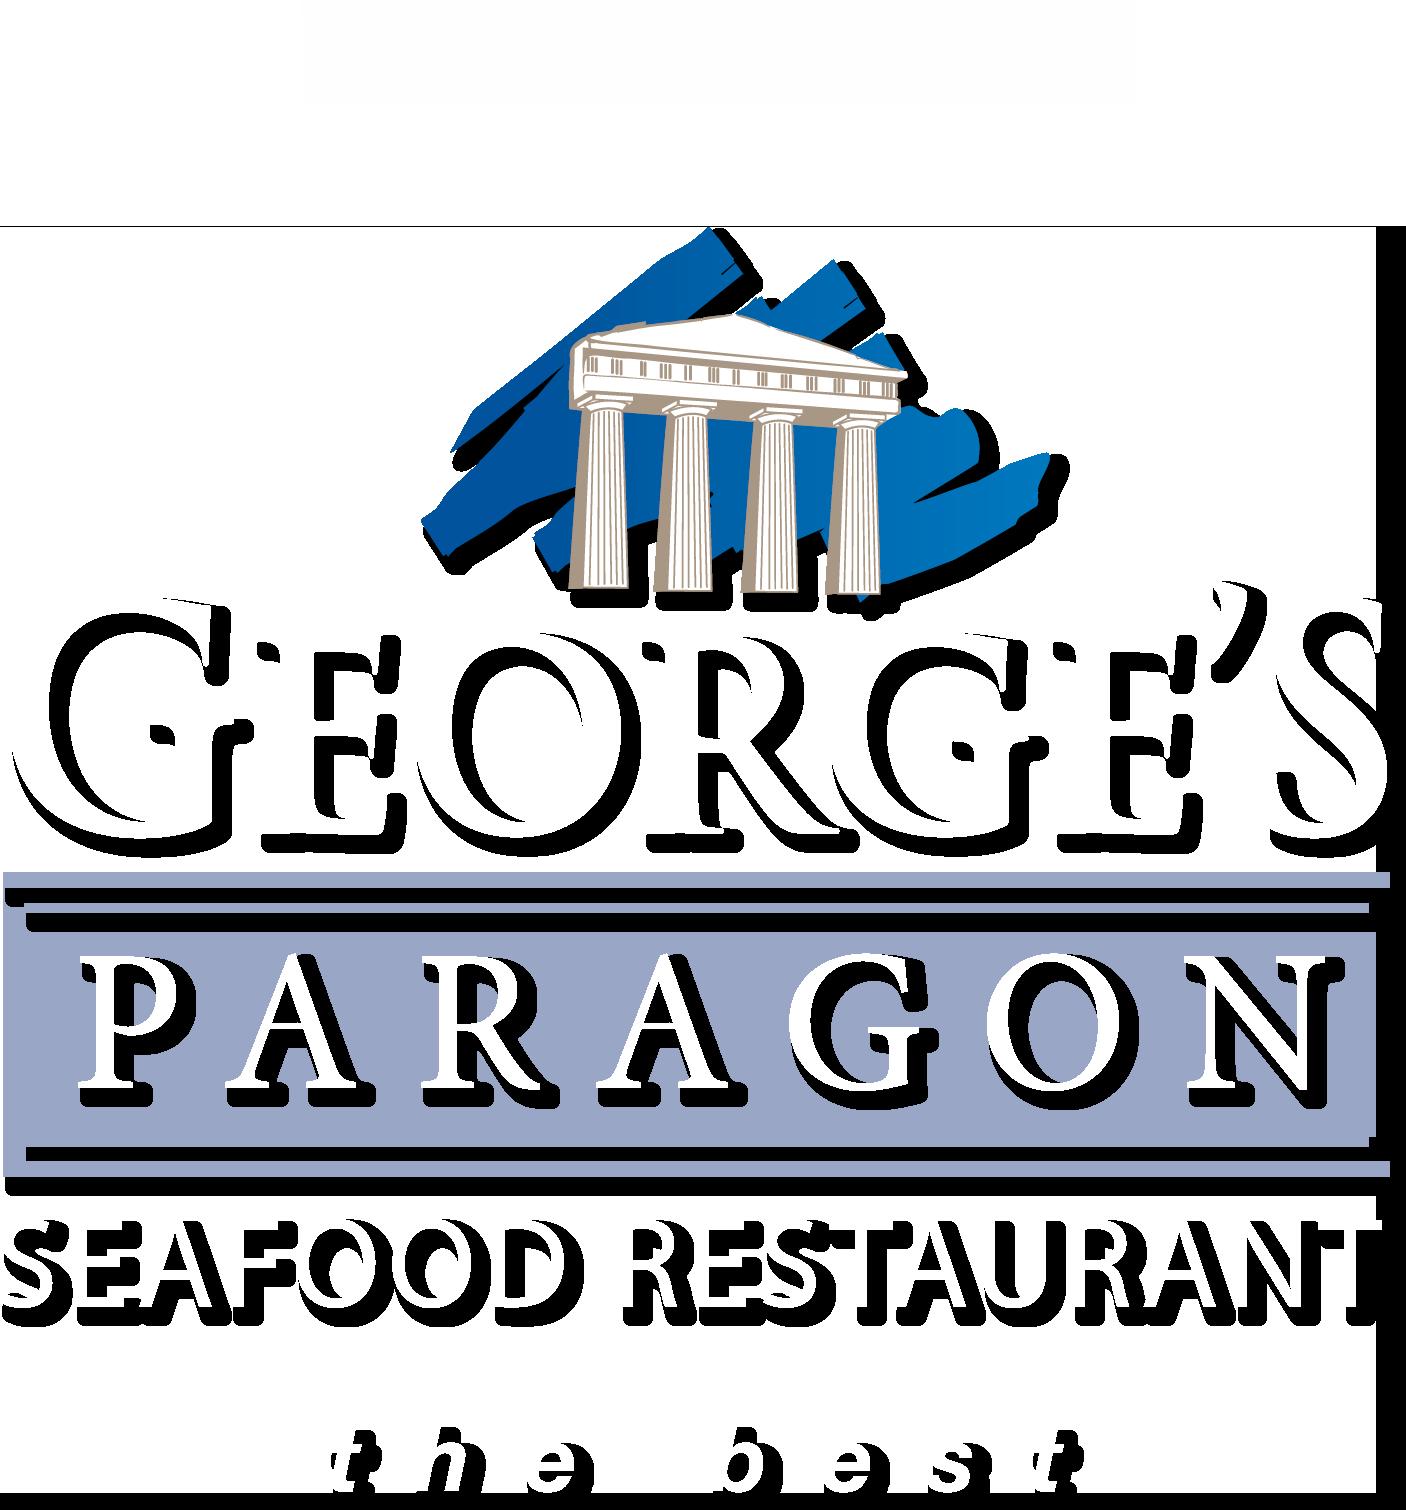 George S Paragon Seafood Restaurant